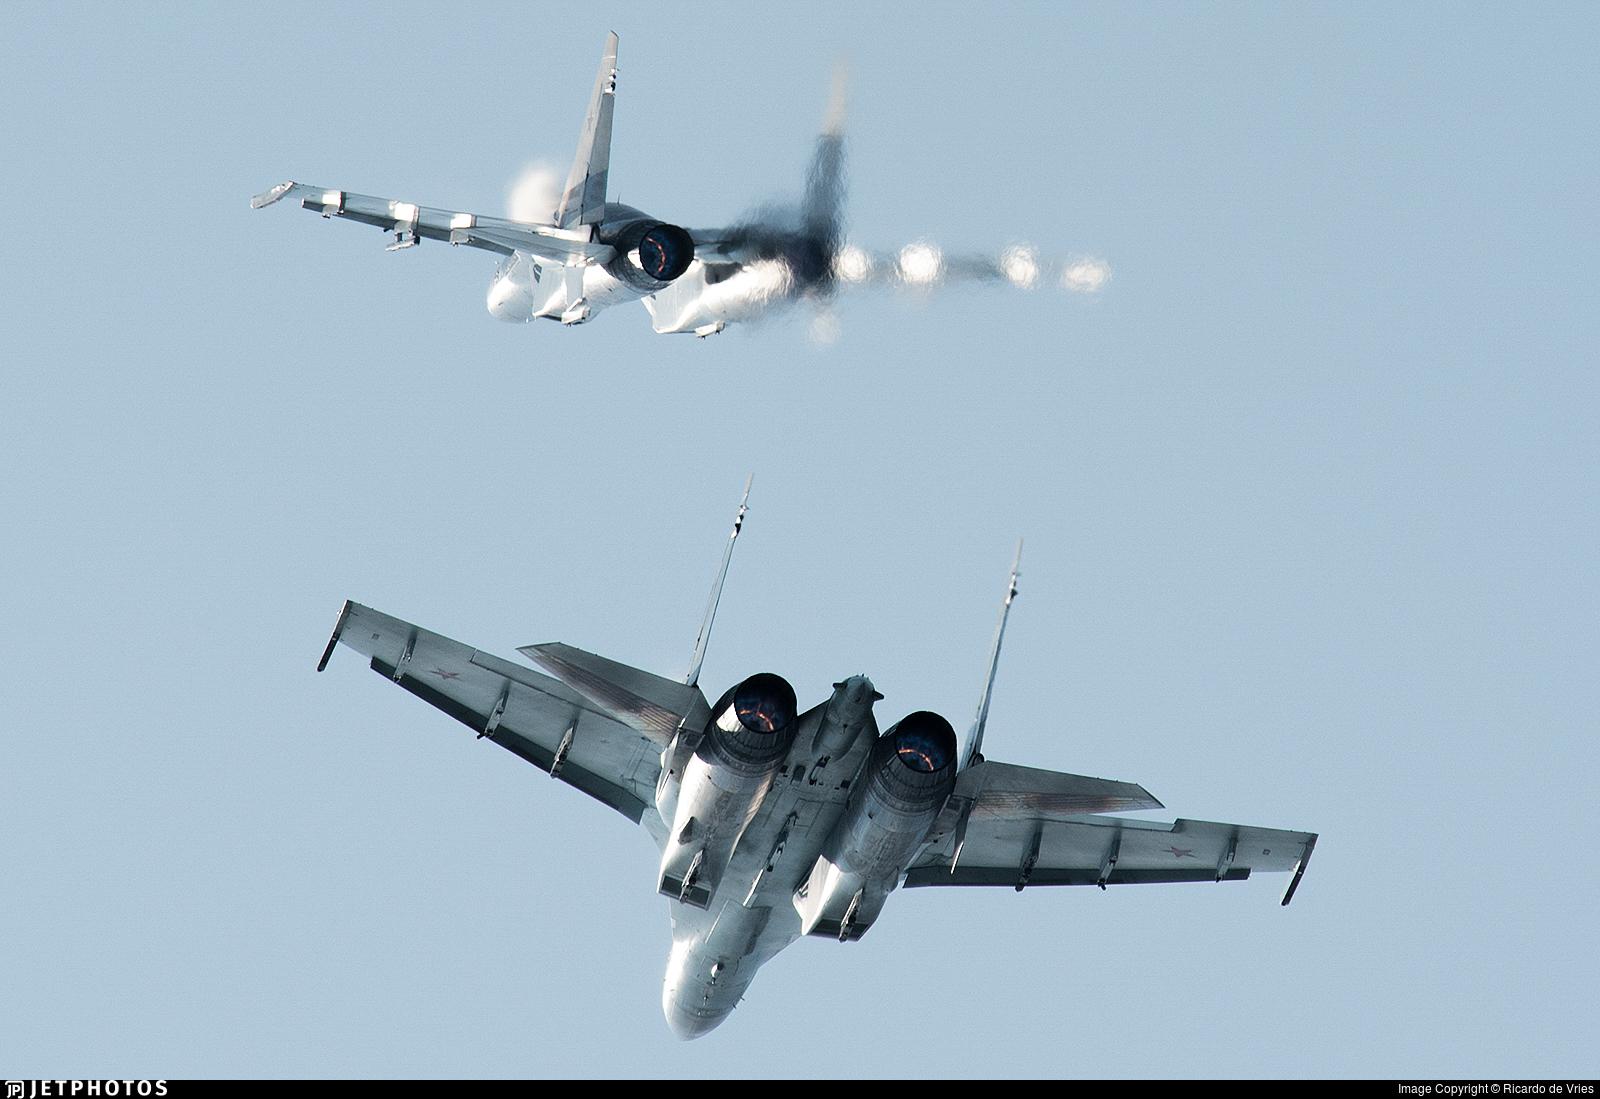 RF-95243 - Sukhoi Su-35S - Russia - Air Force